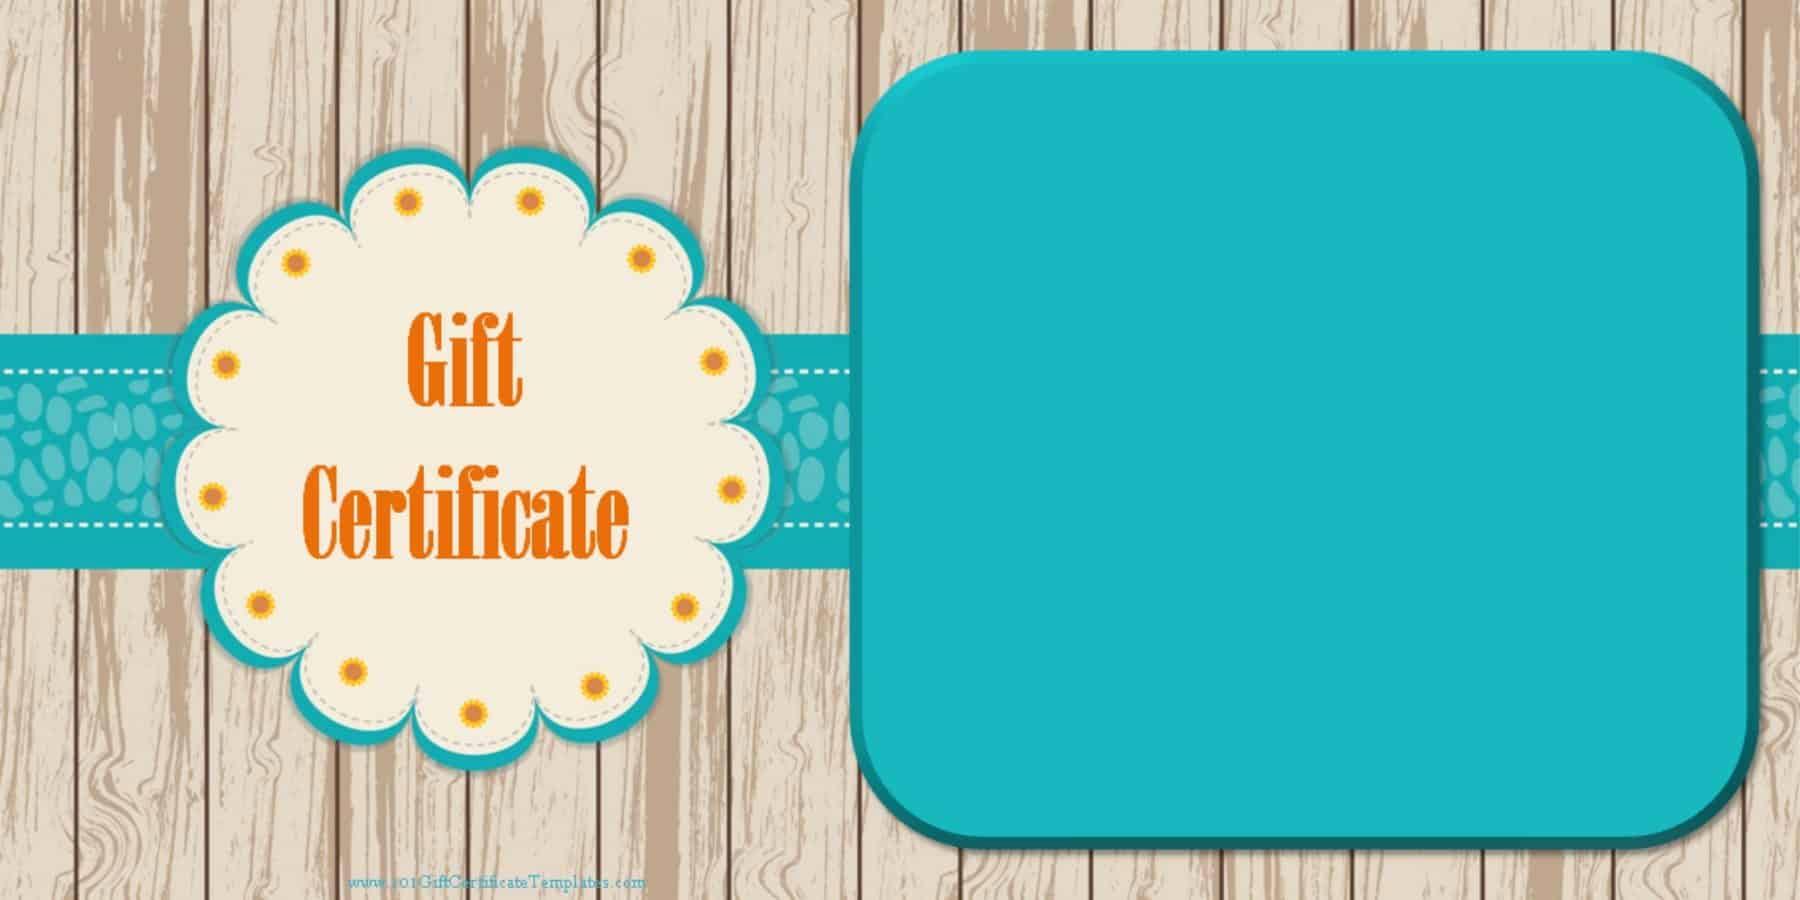 Gift Certificate Template Printable Elegant Printable Gift Certificate Templates